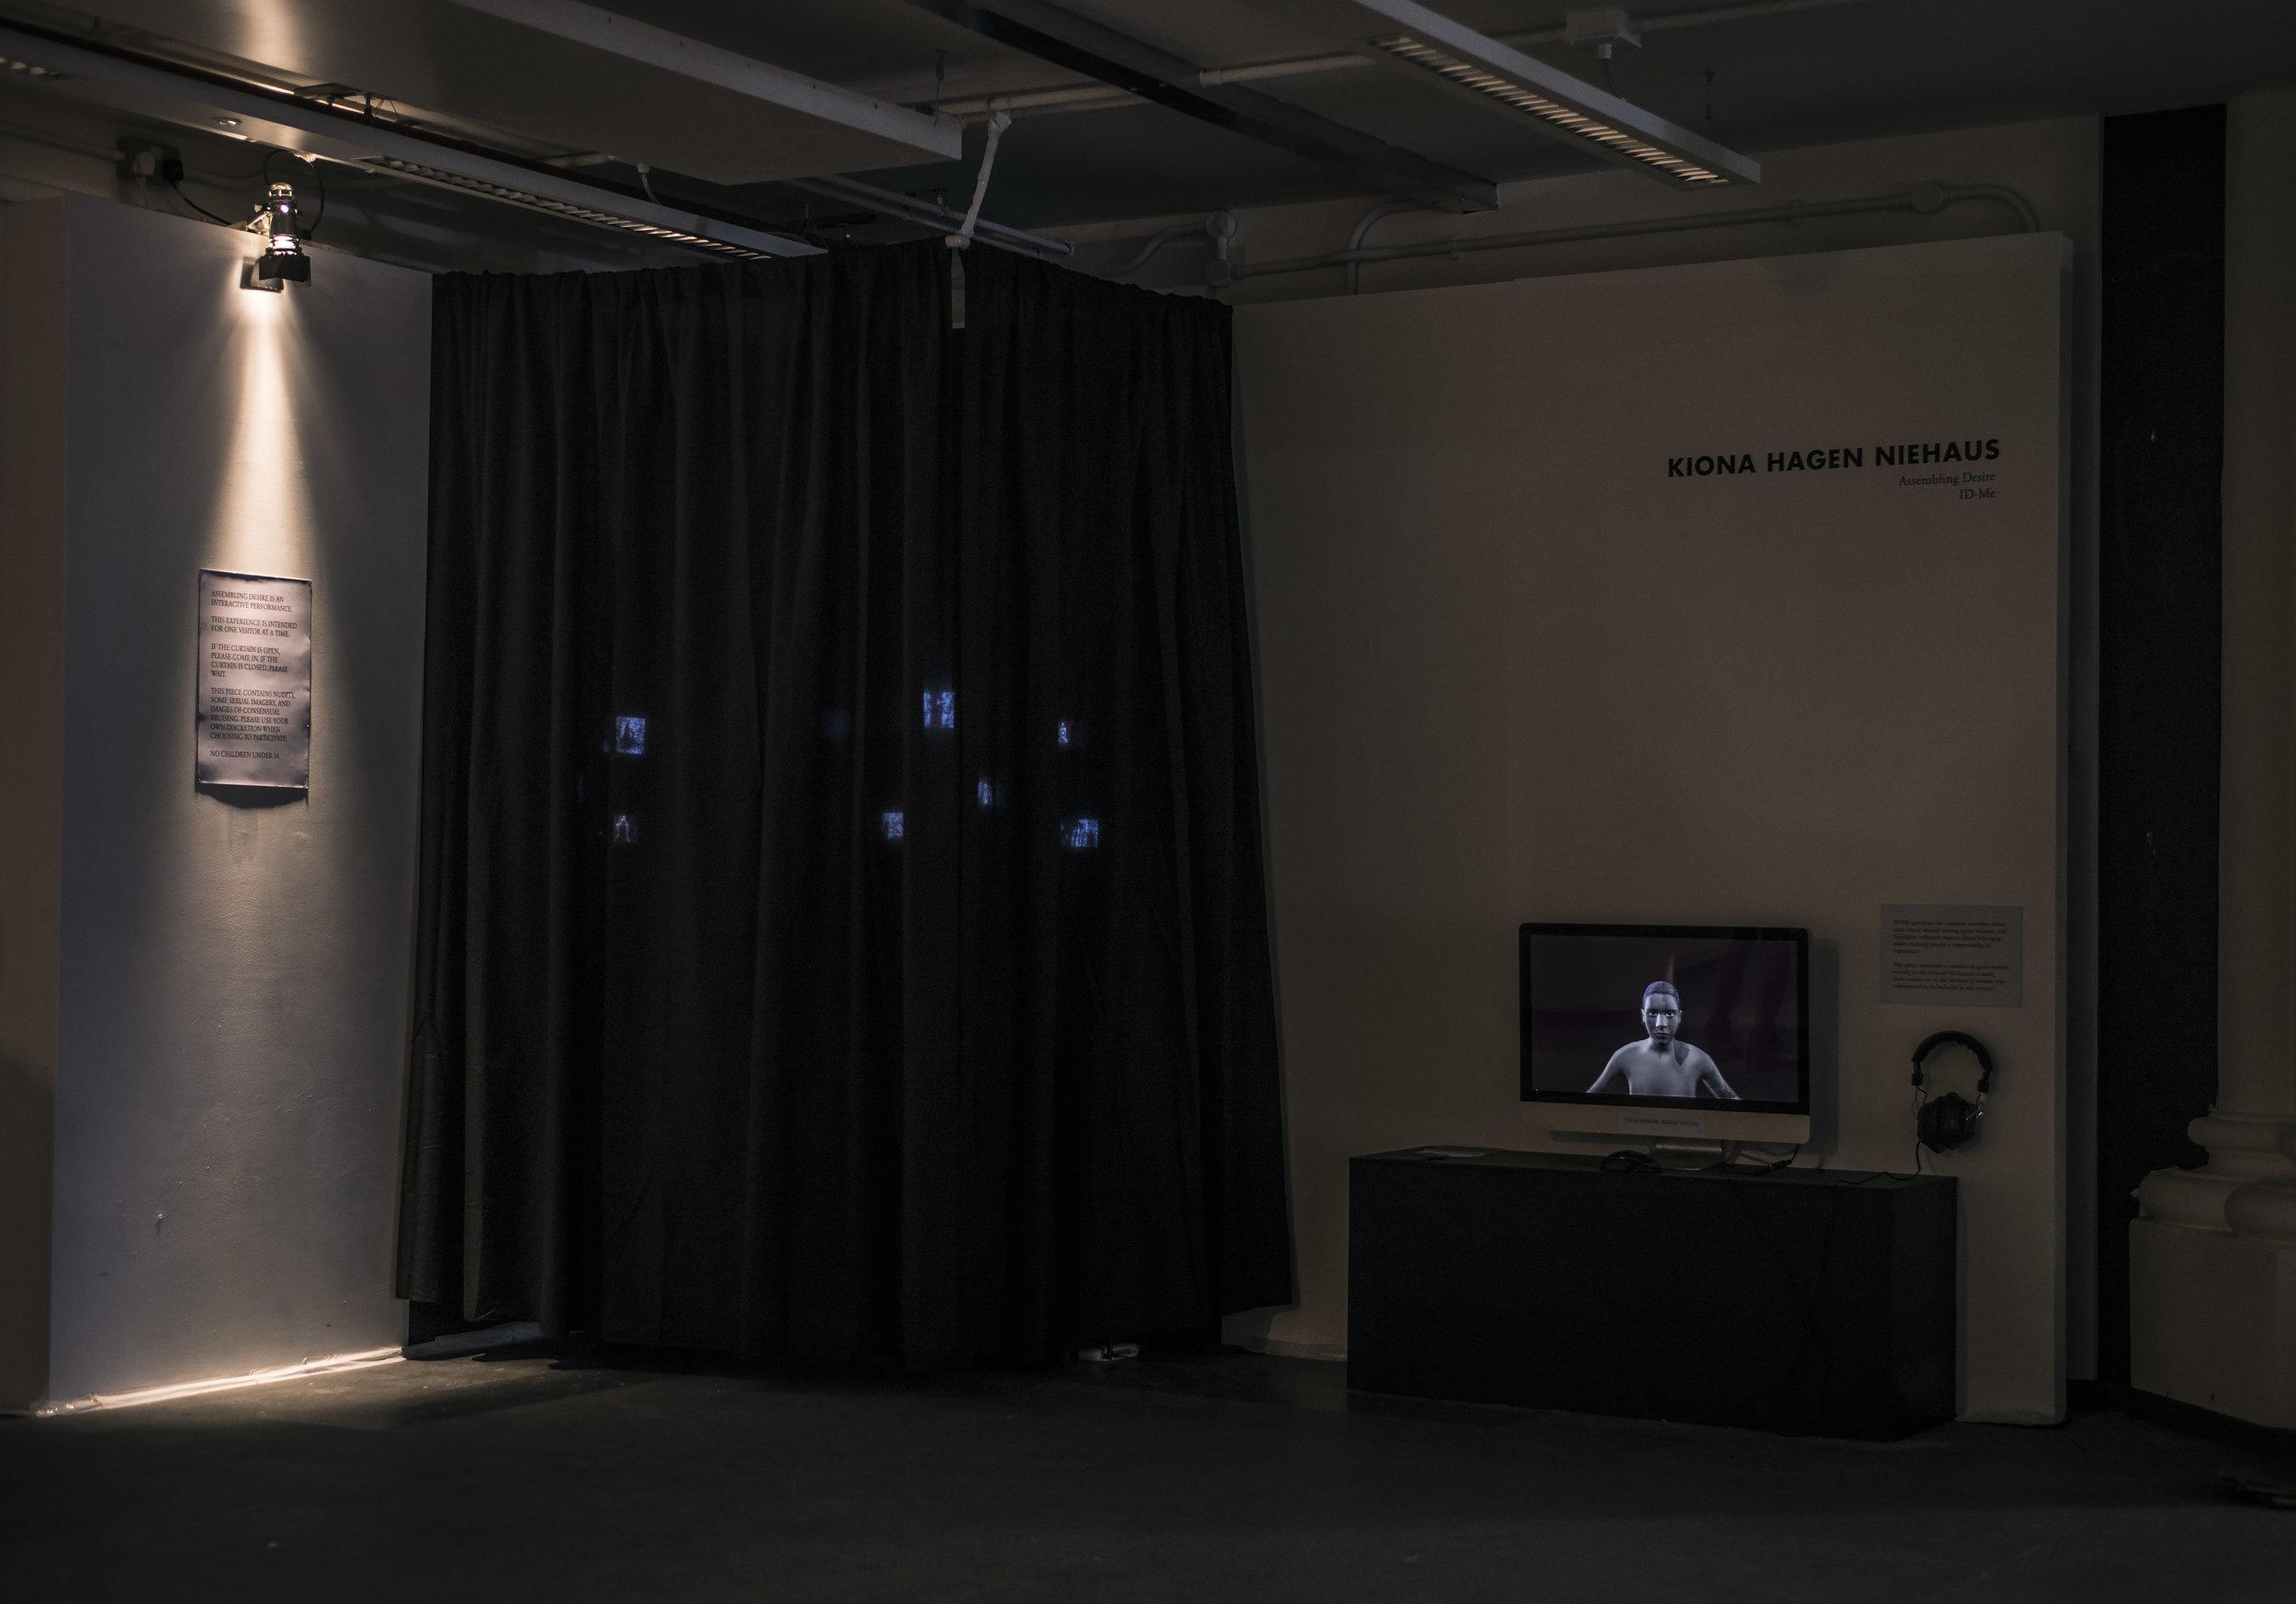 Assembling Desire , installed at Goldsmiths, University of London during Metasis MA/MFA Computational Arts Exhibition, 8-11 September 2016